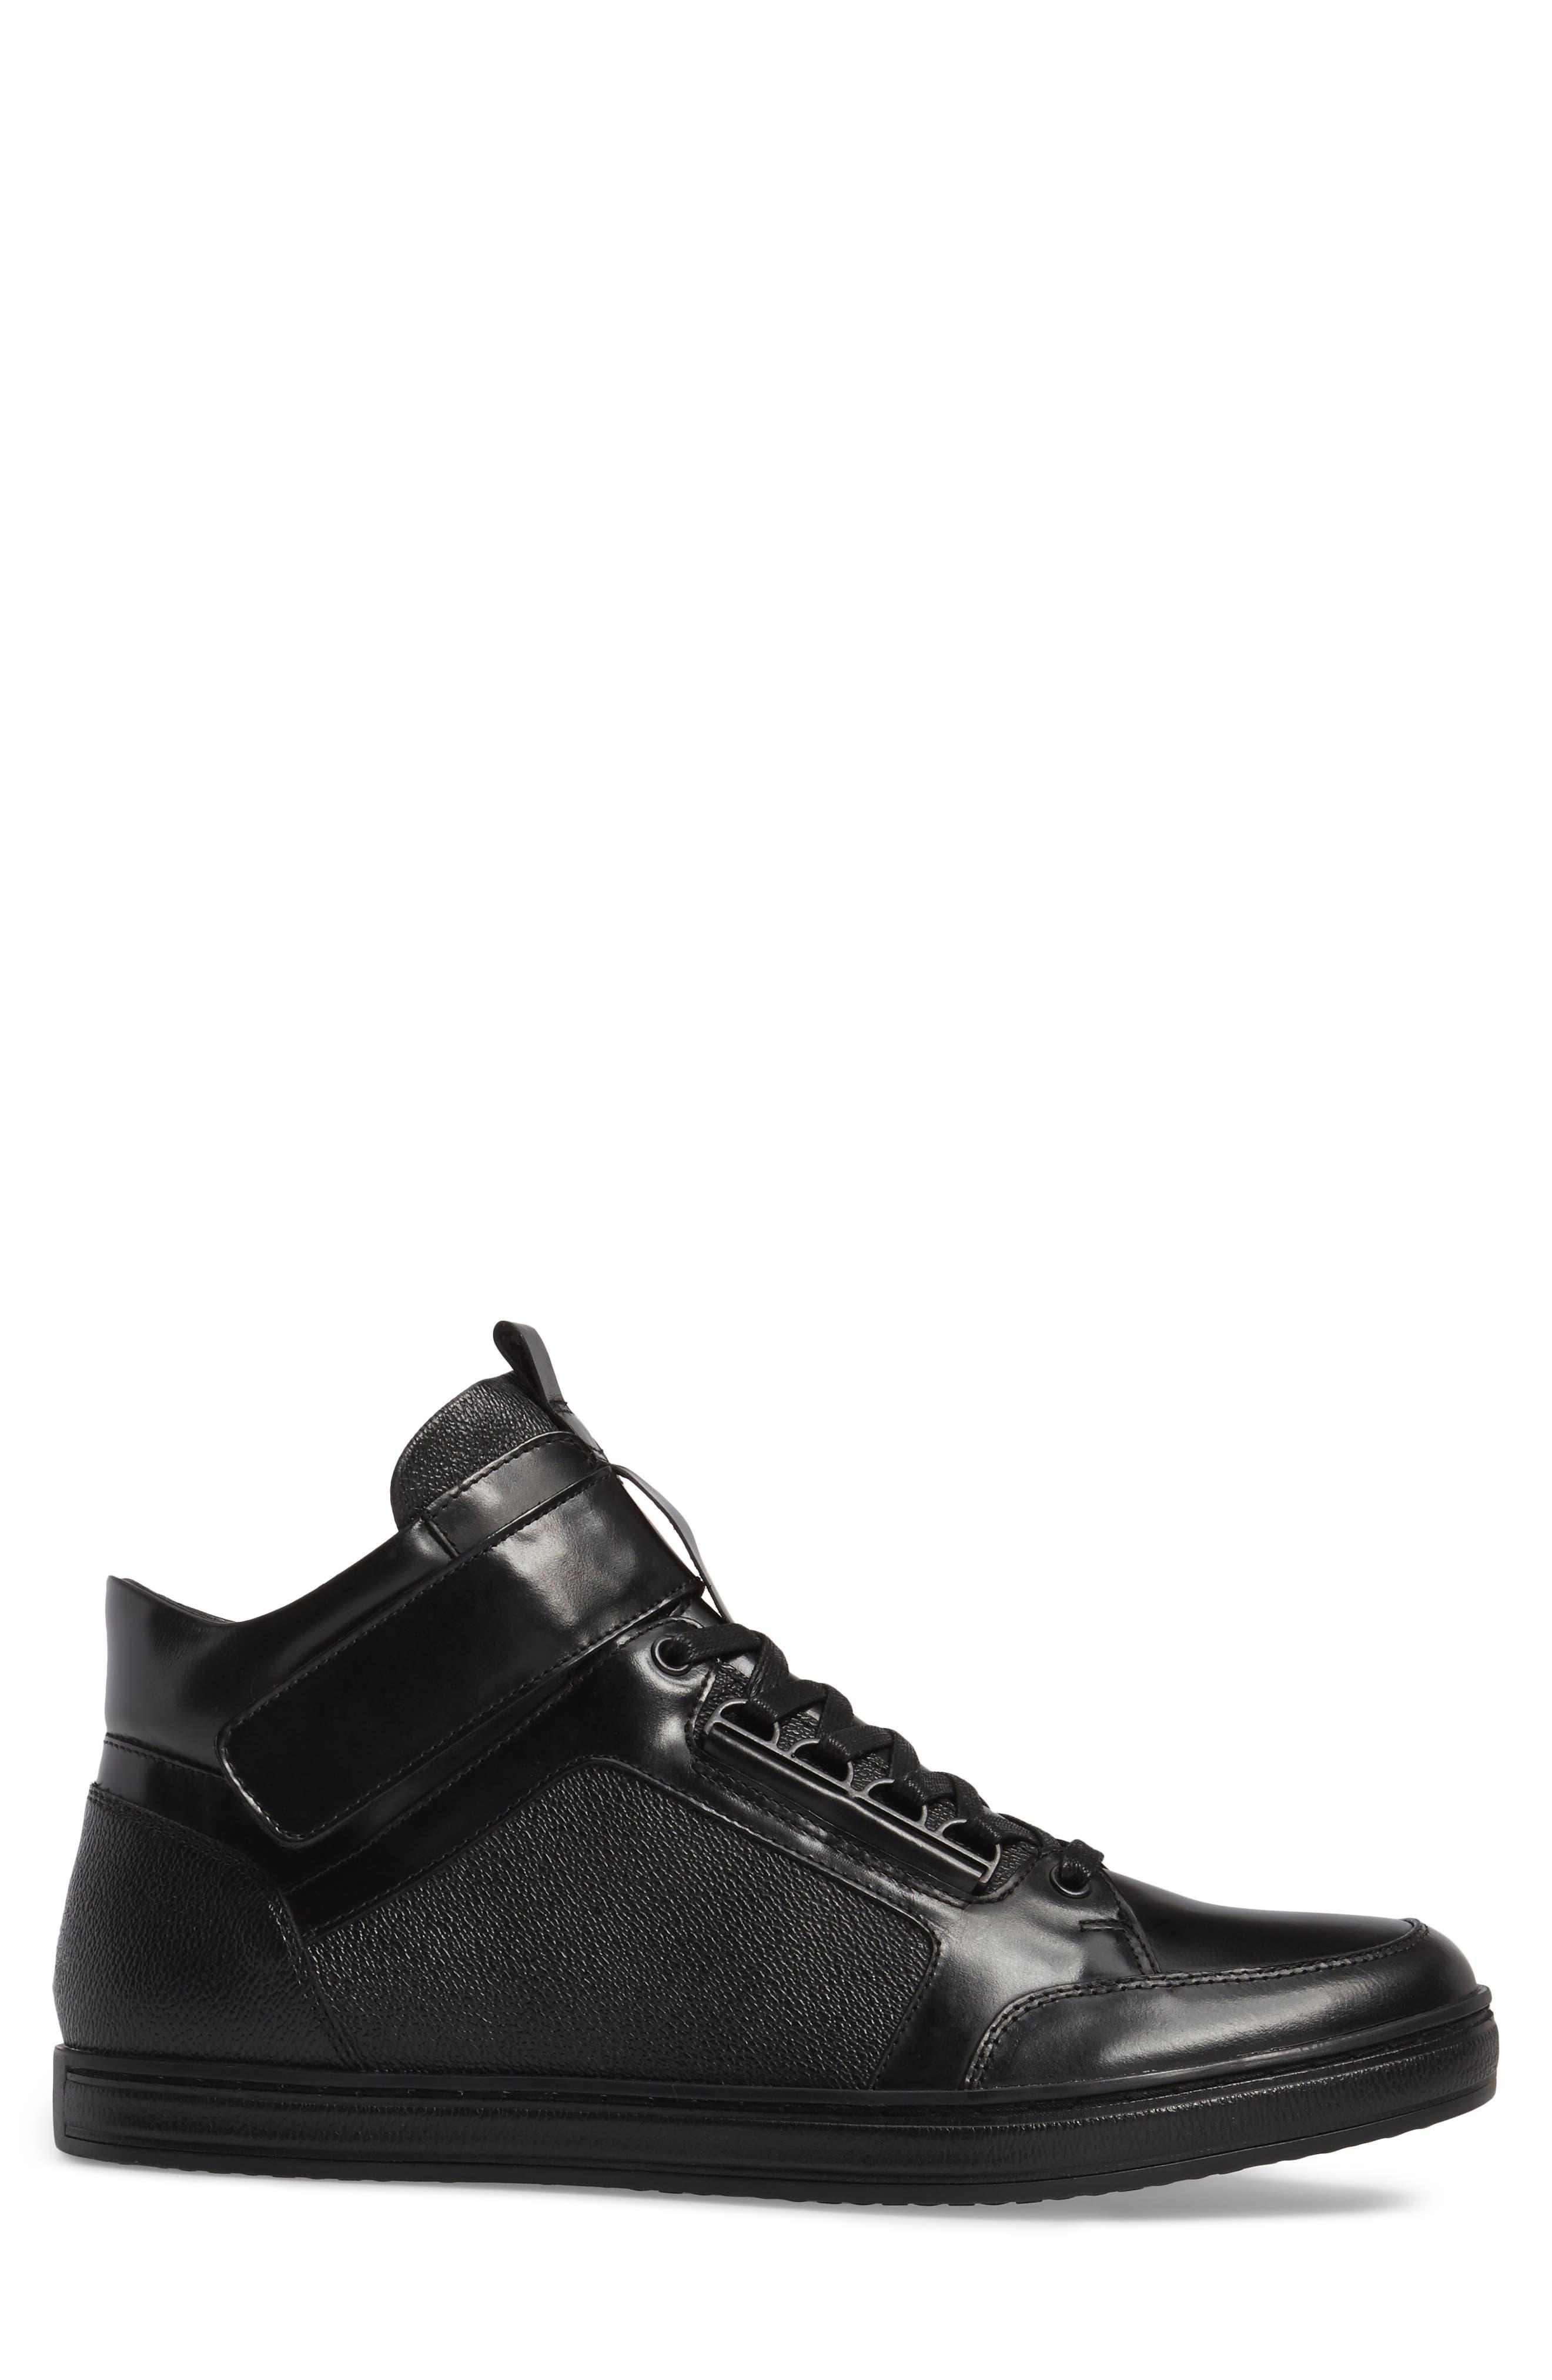 Brand-Y Sneaker,                             Alternate thumbnail 3, color,                             001